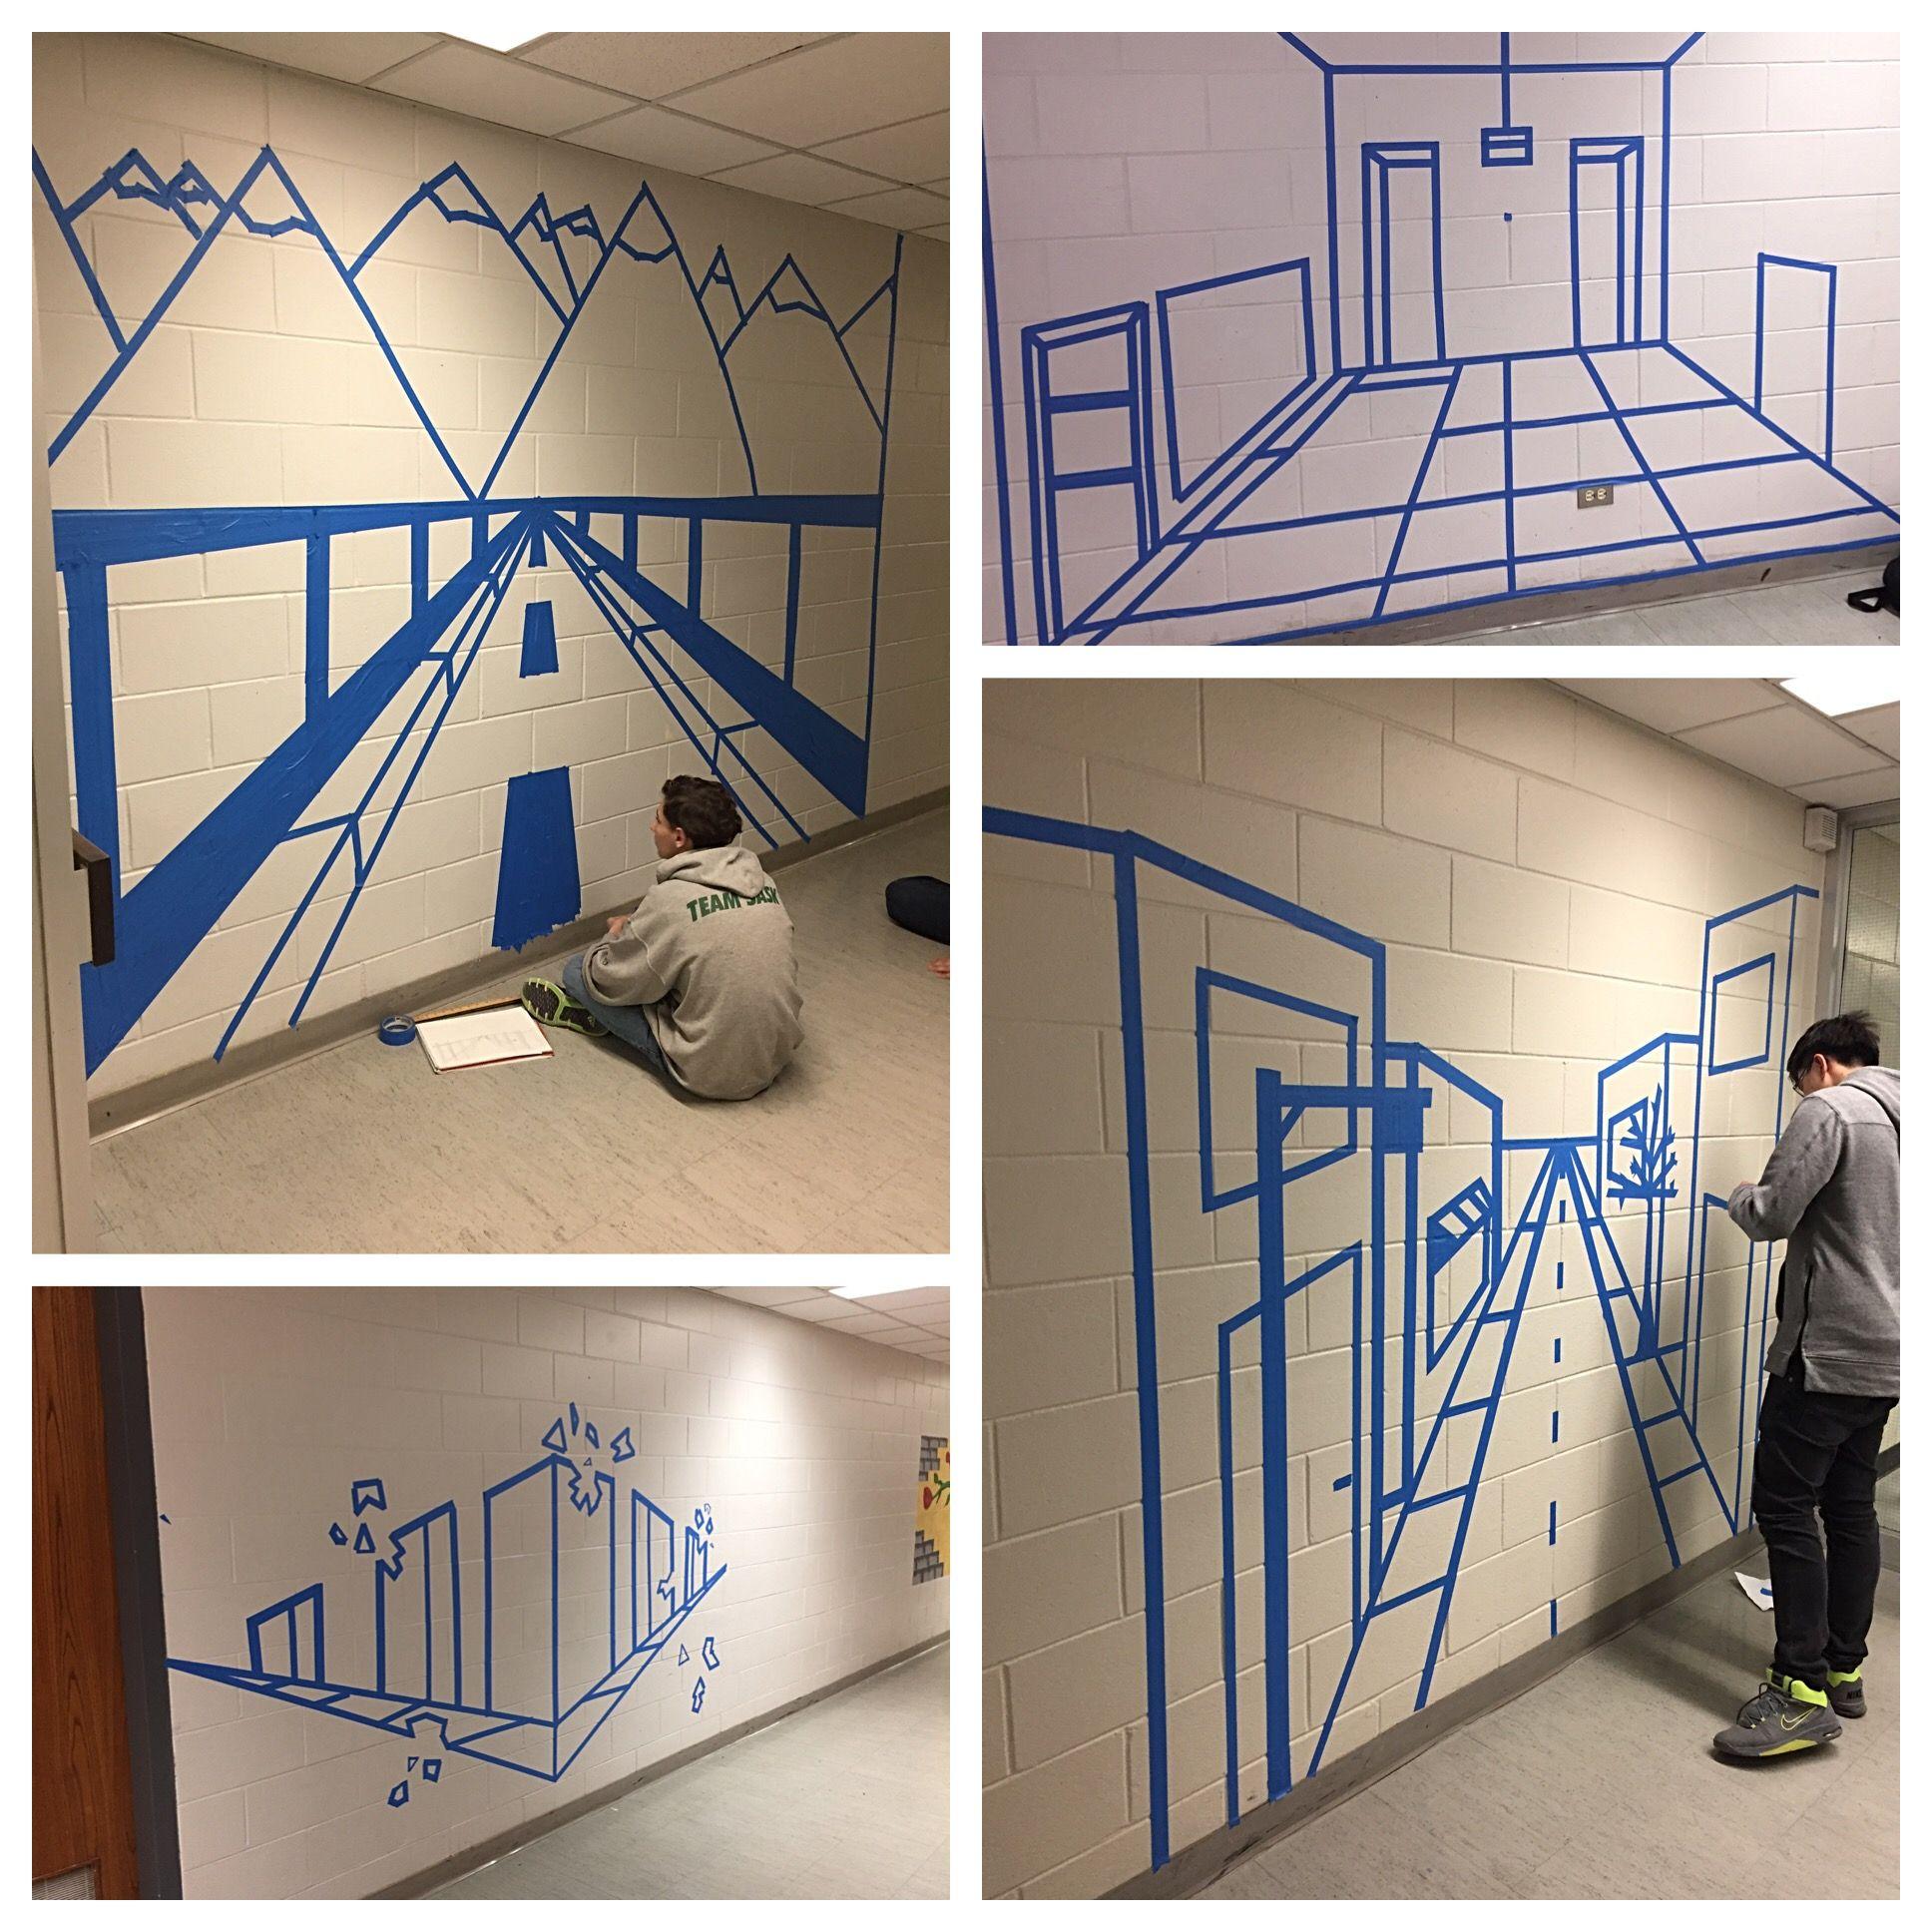 Perspective Tape Wall Murals Grade 9 Scchs Art Art Lesson Plans Middle School Middle School Art Projects Art Lessons Middle School